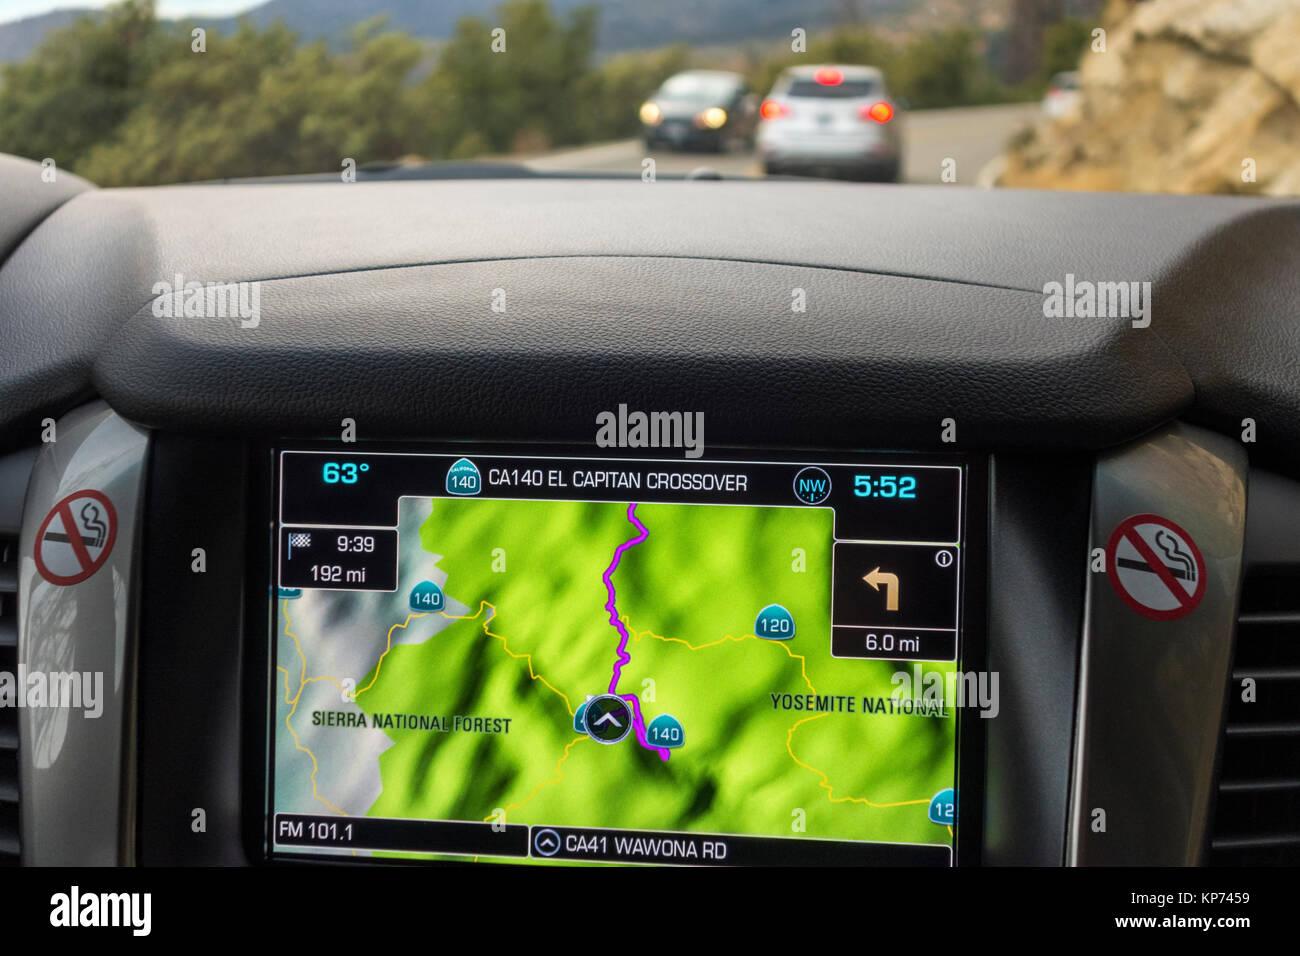 Sat nav, satnav, gps, car navigation integrated in dashboard in American SUV Chevy Tahoe 2018. Driving through Yosemite - Stock Image